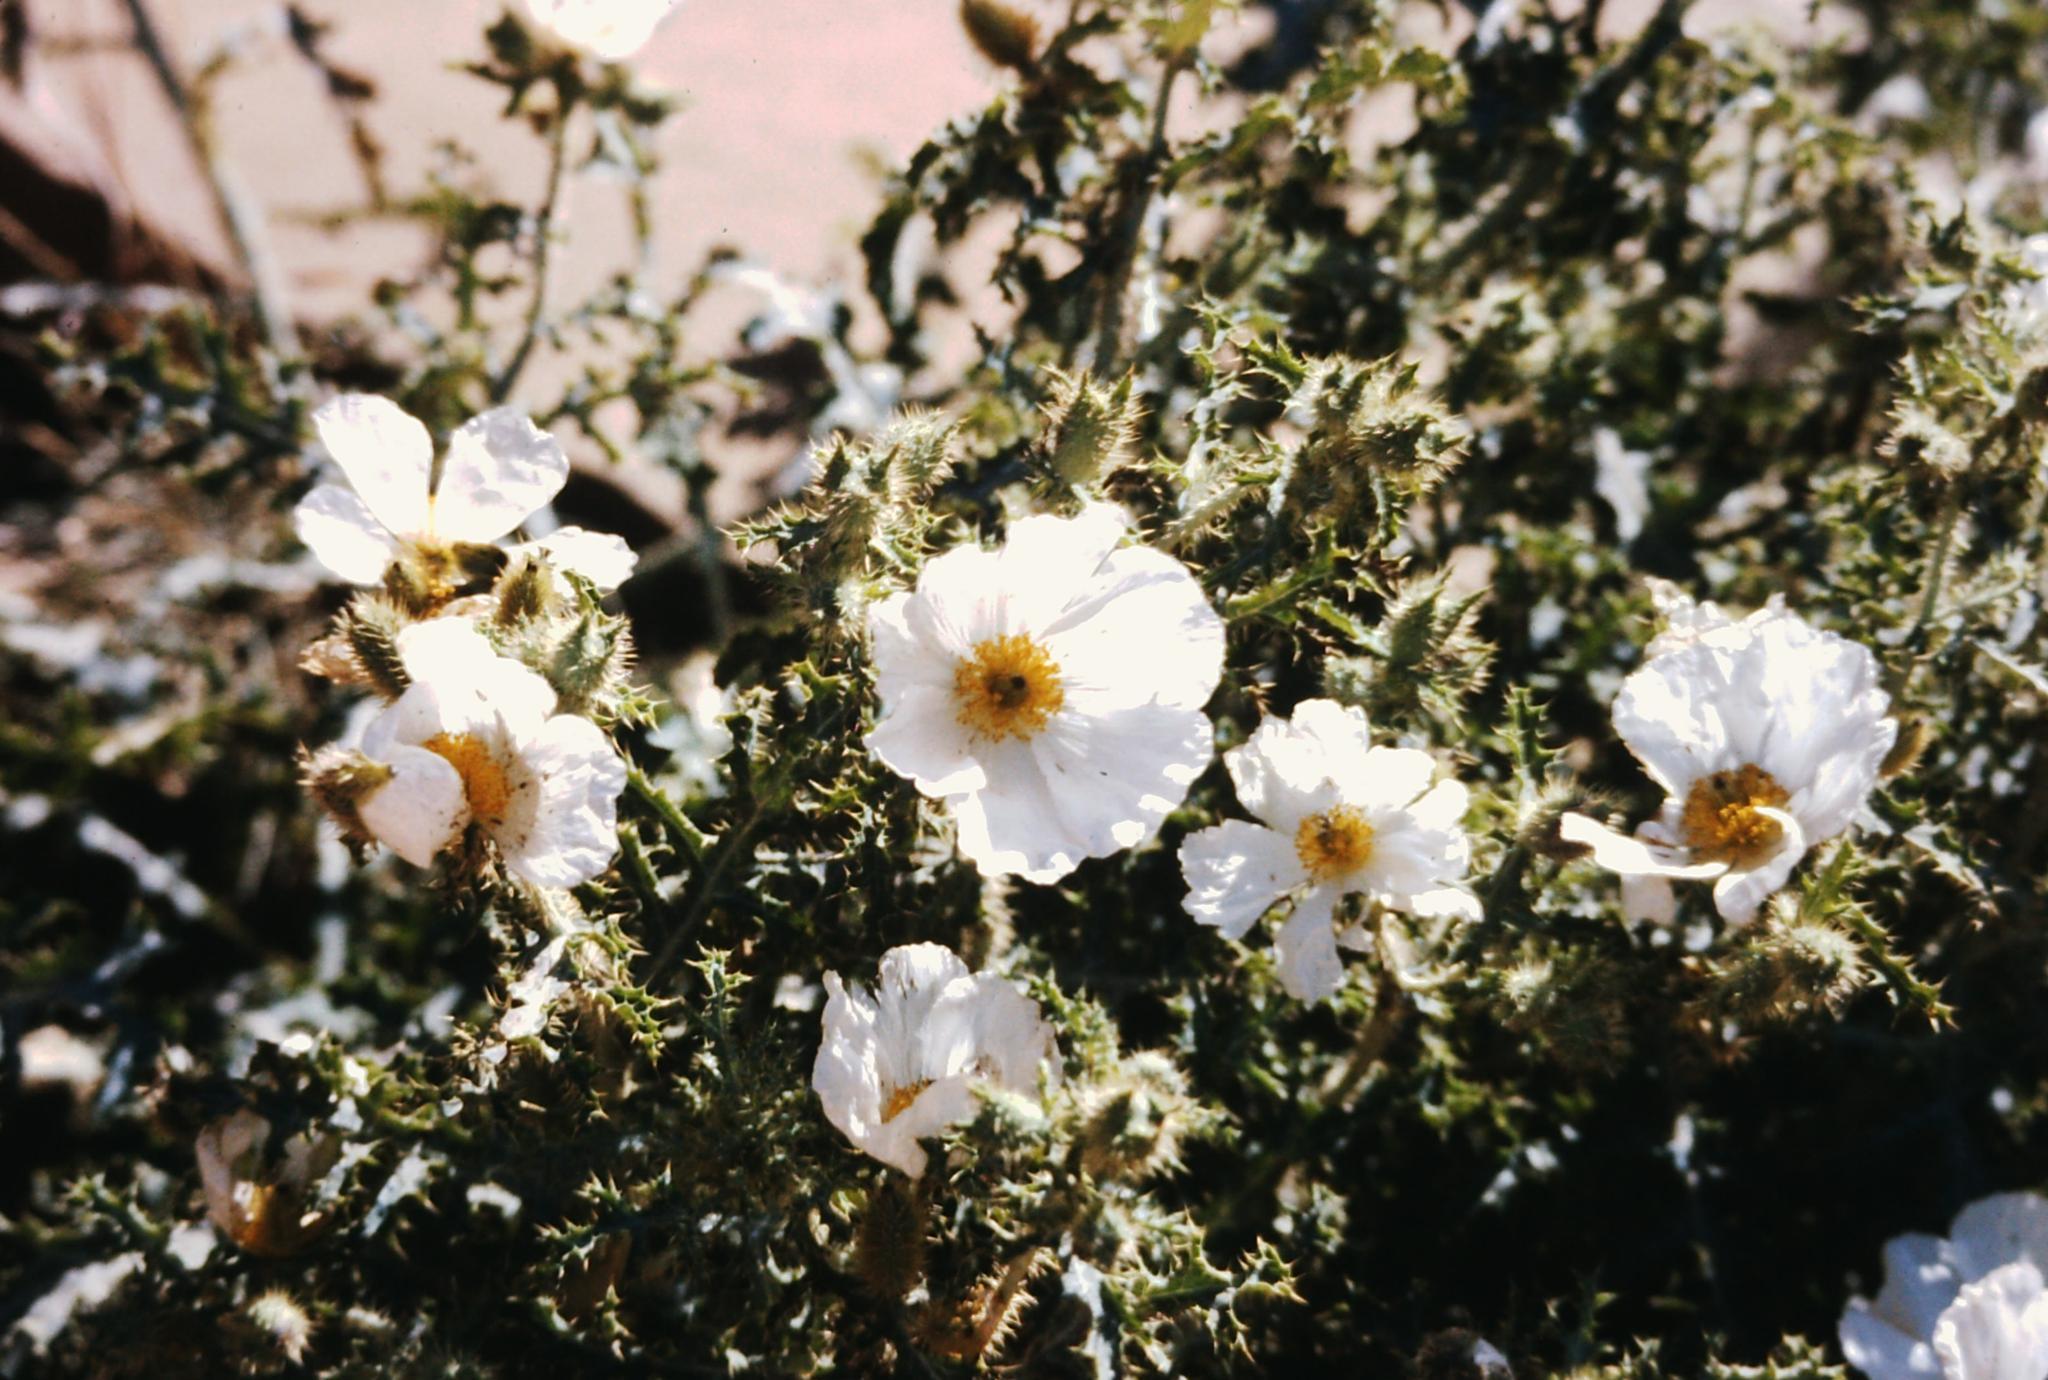 Grand Canyon flowers by josef.bartruff